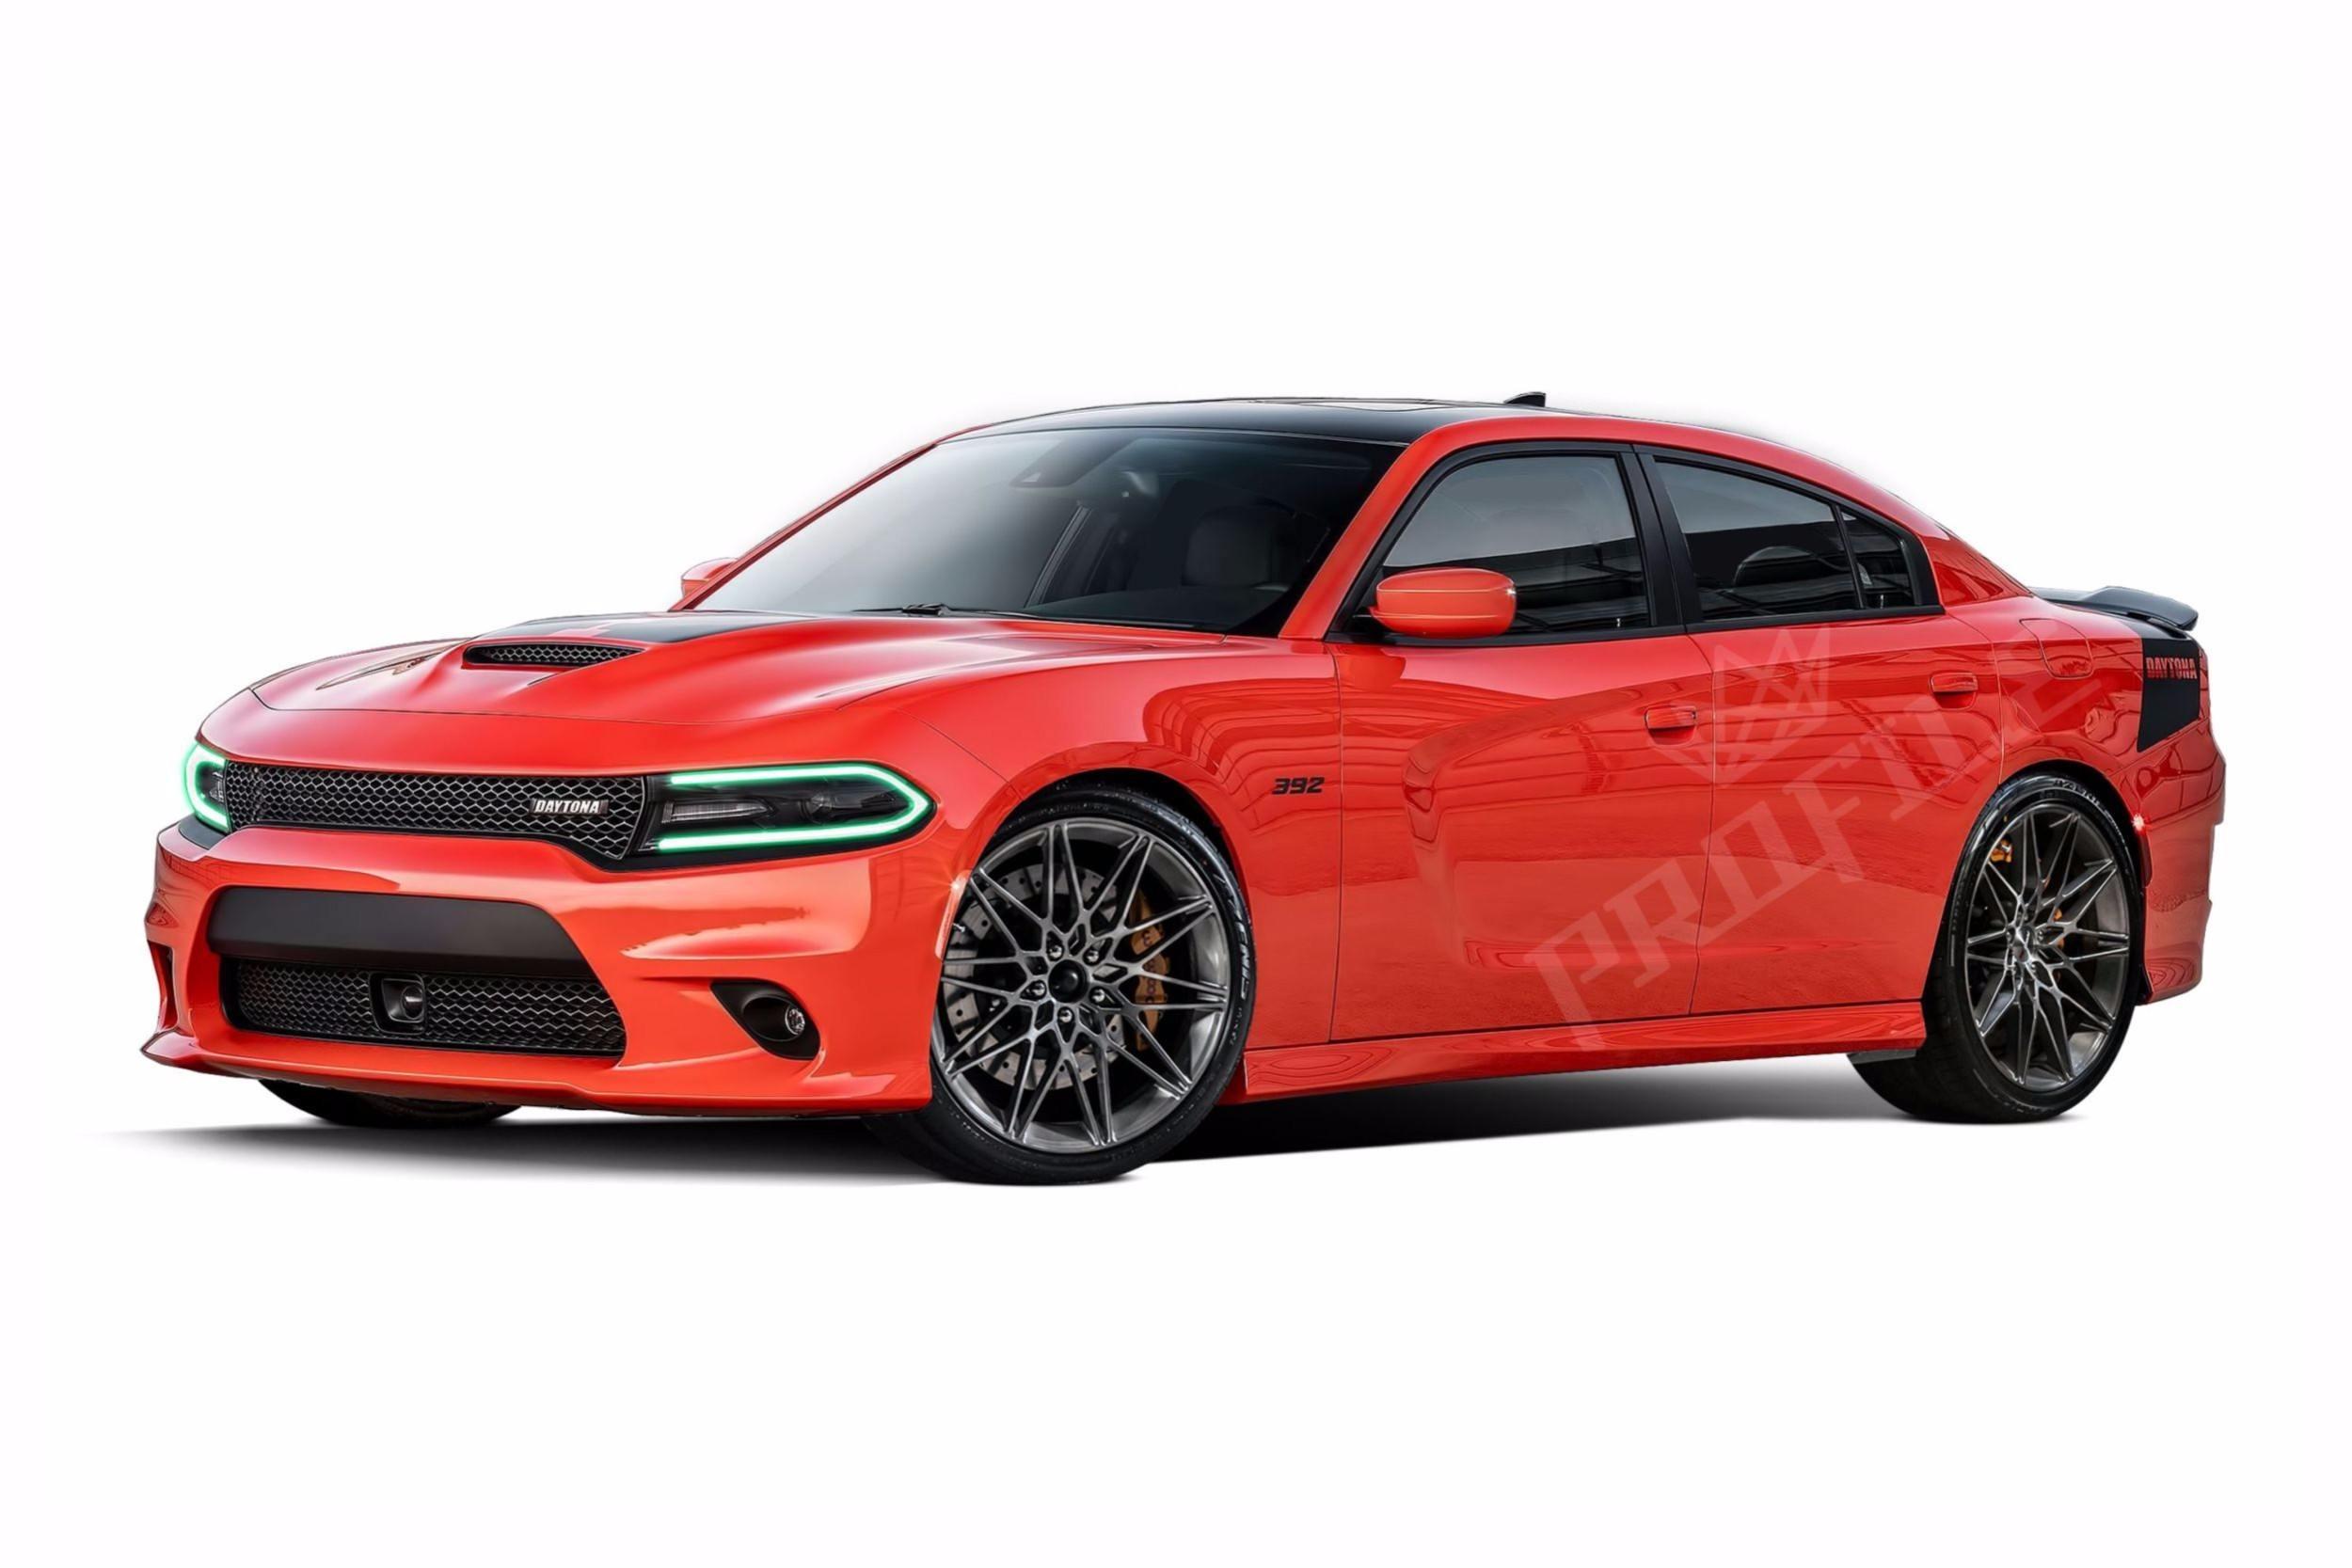 preowned ford dealership keller in pa locations dodge lebanon lancaster dealer new bros htm